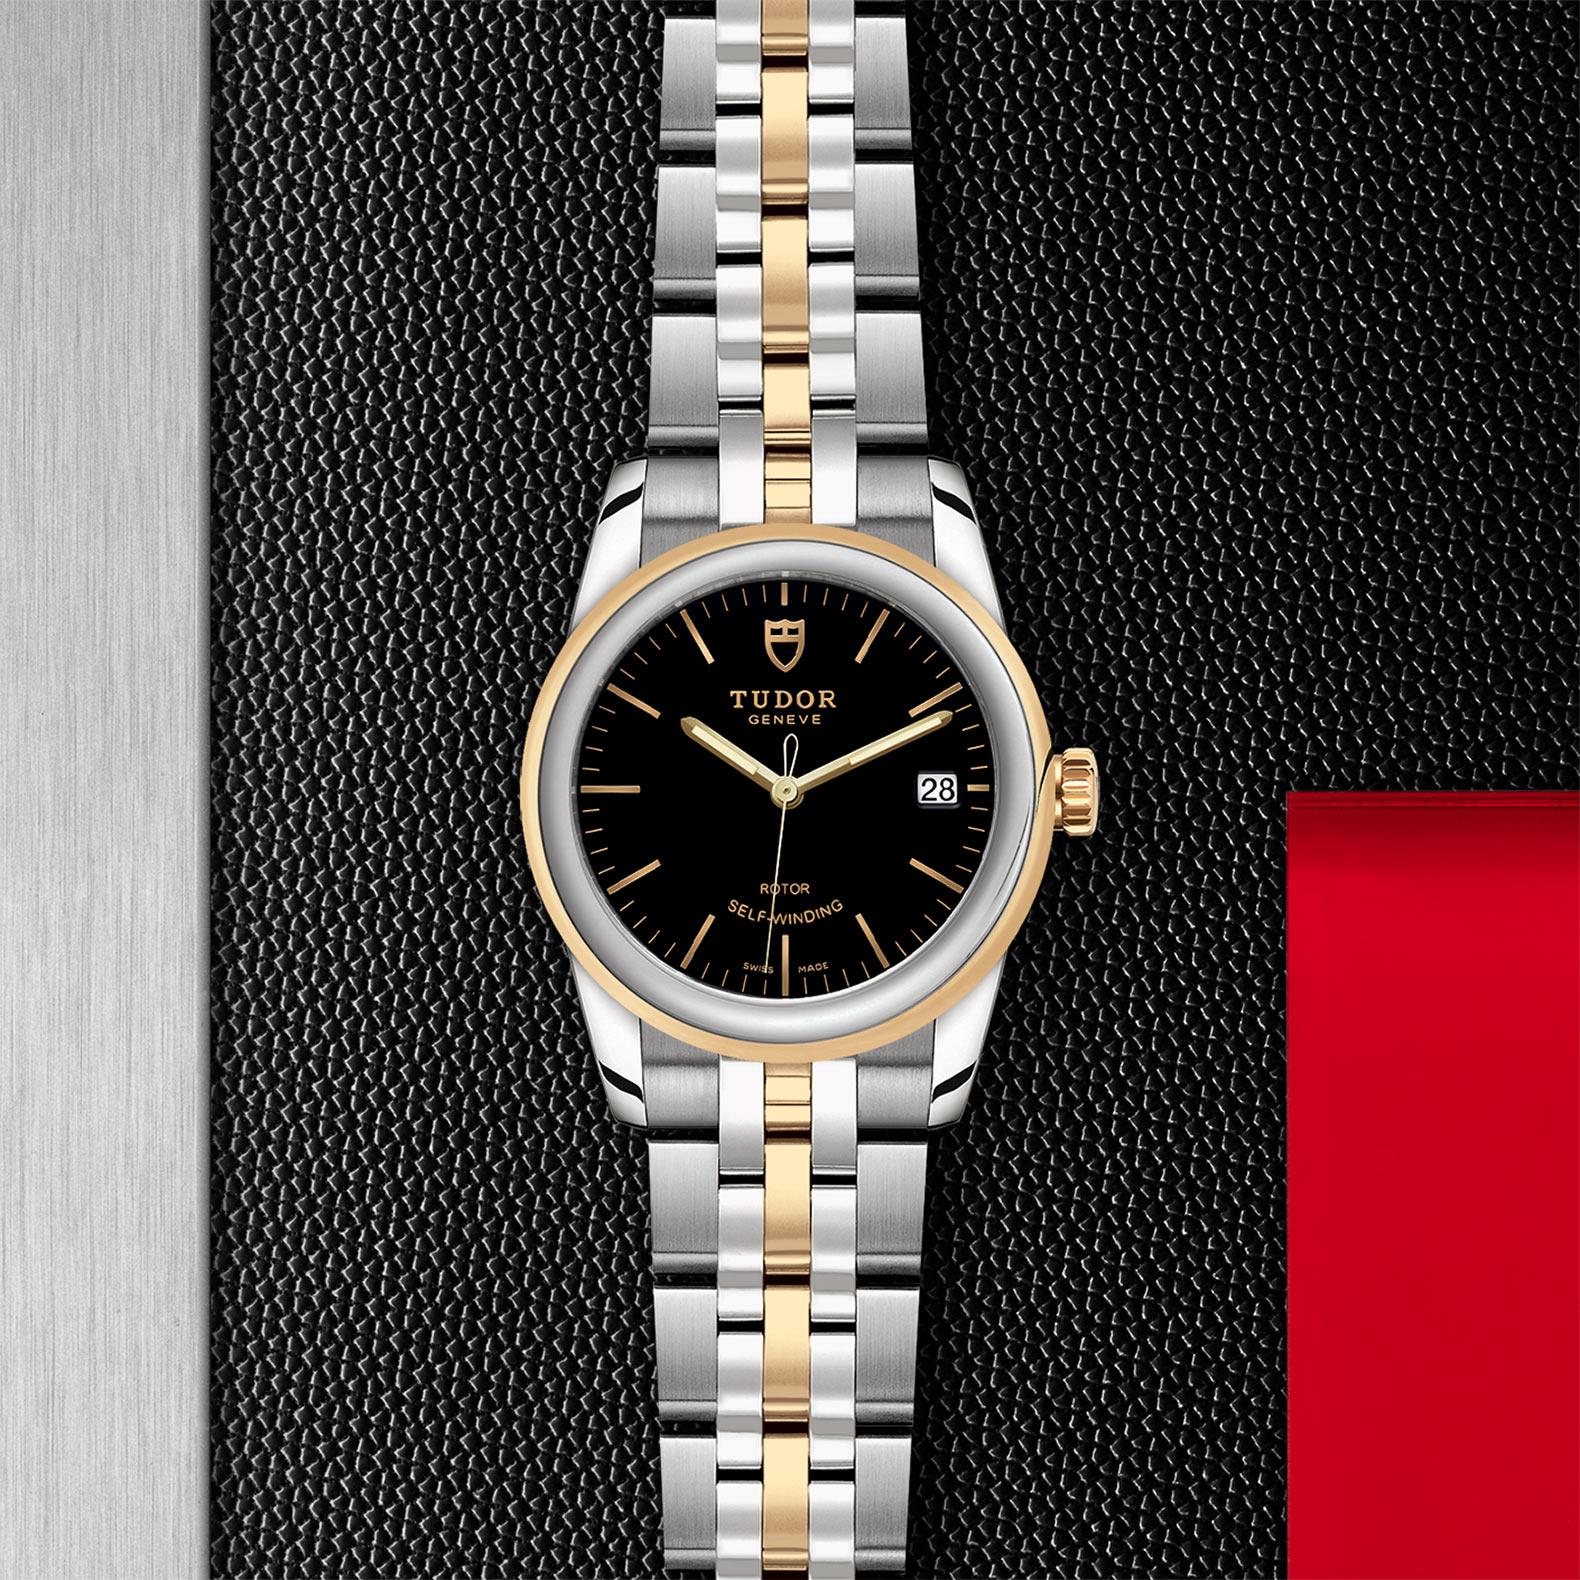 TUDOR Glamour Date - M55003-0007